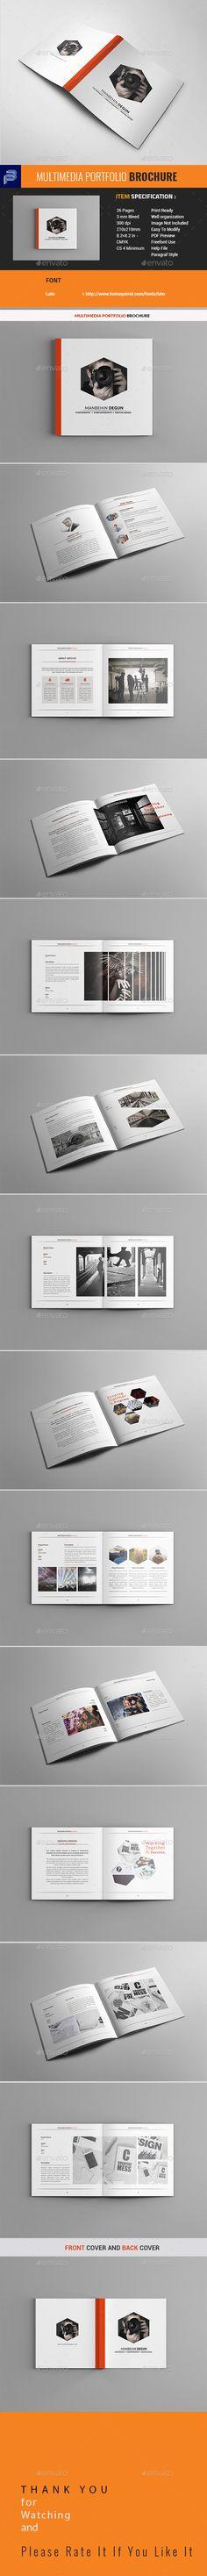 Multimedia Portfolio Brochure #corporate #indesign  • Download here → https://graphicriver.net/item/multimedia-portfolio-brochure/21242762?ref=pxcr